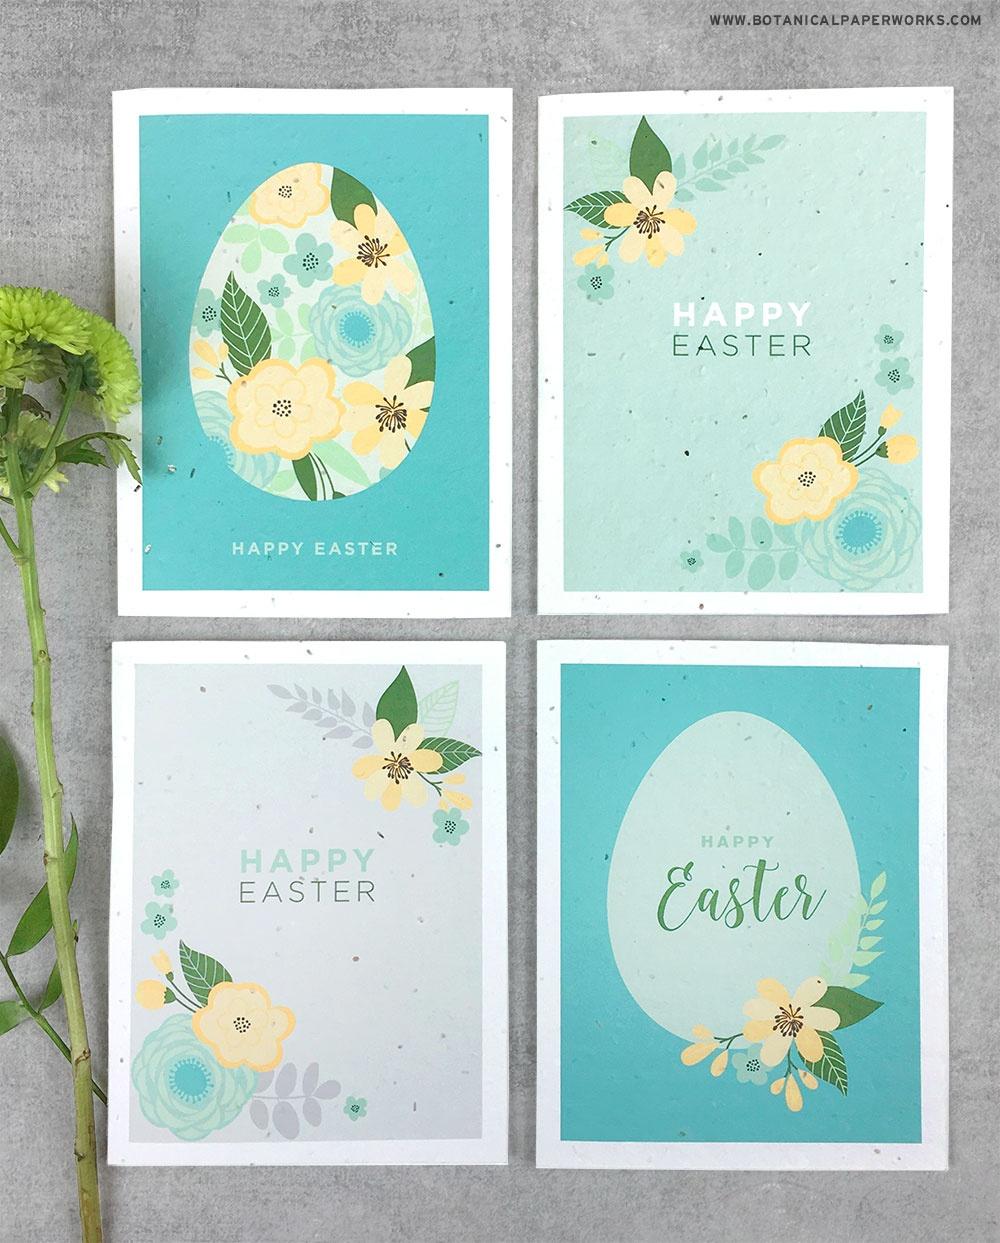 Free Printable} Easter Cards | Blog | Botanical Paperworks - Free Printable Easter Cards To Print